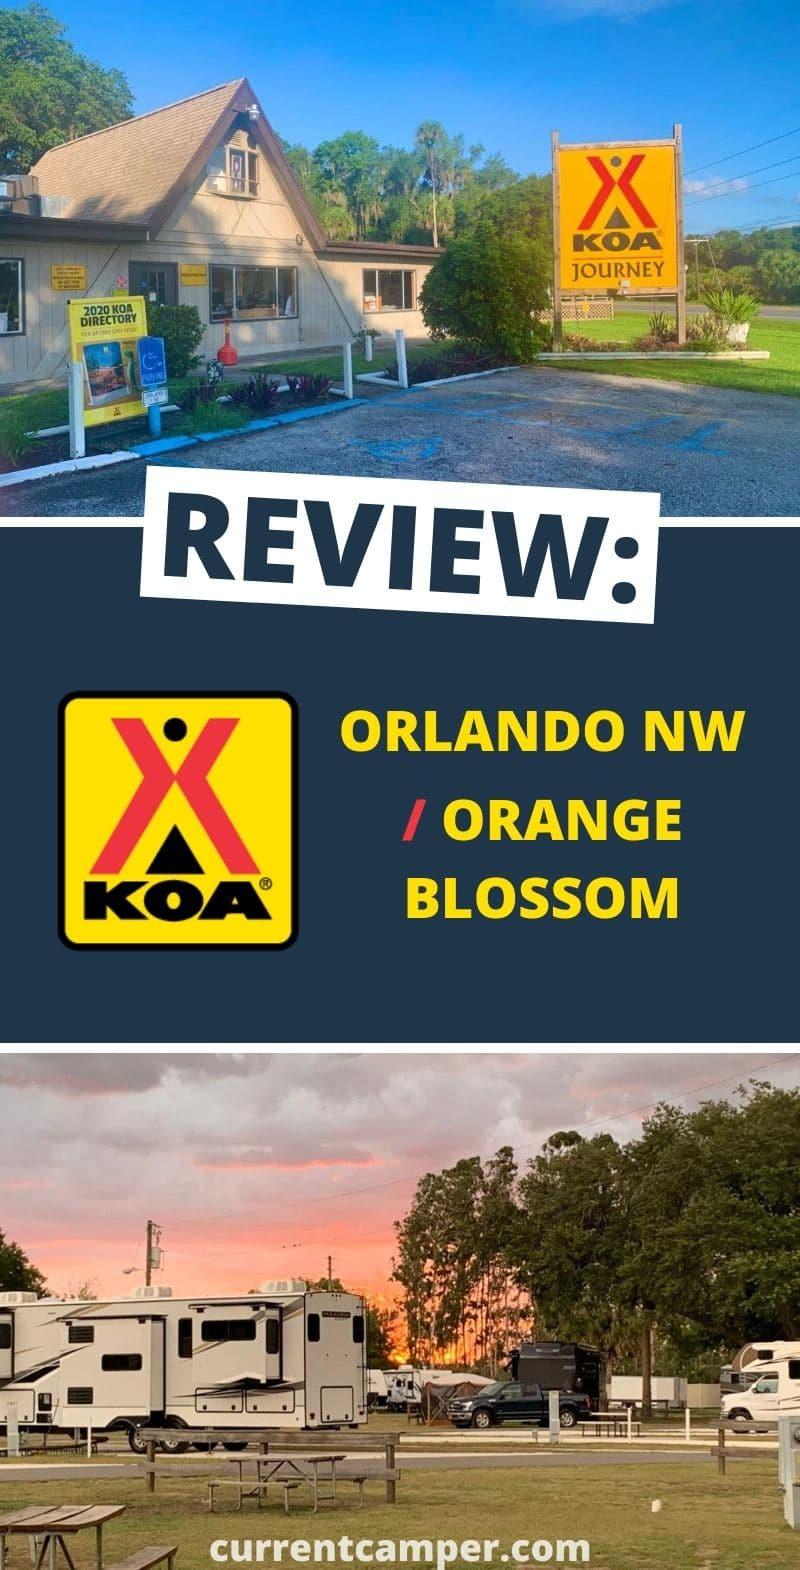 koa review #koa camping tips #orlando Orlando campground #camper camper #rv #rving #travel Florida